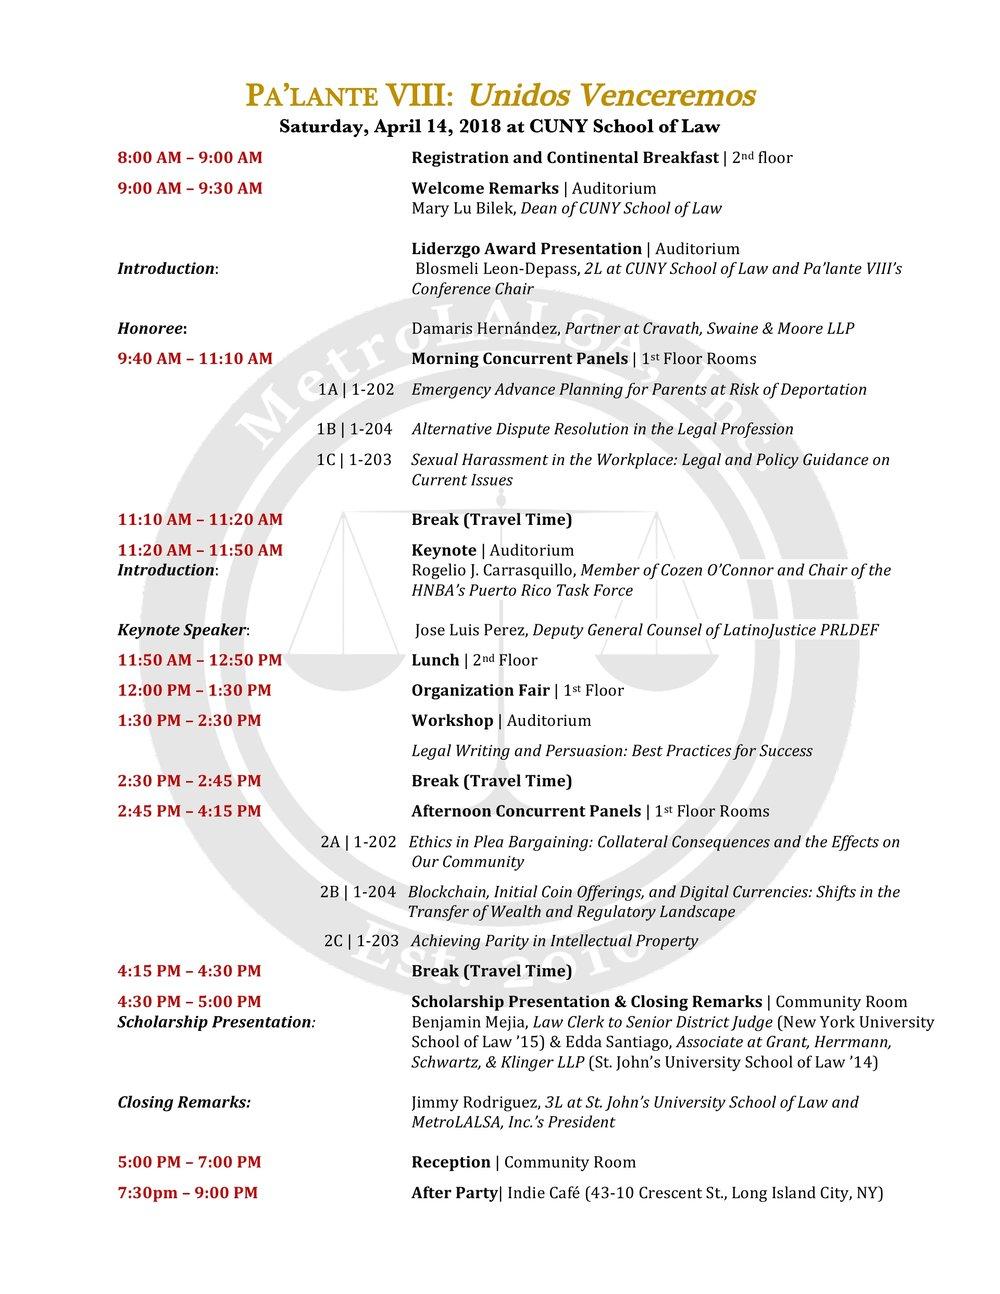 Pa'lante VIII Schedule.jpg